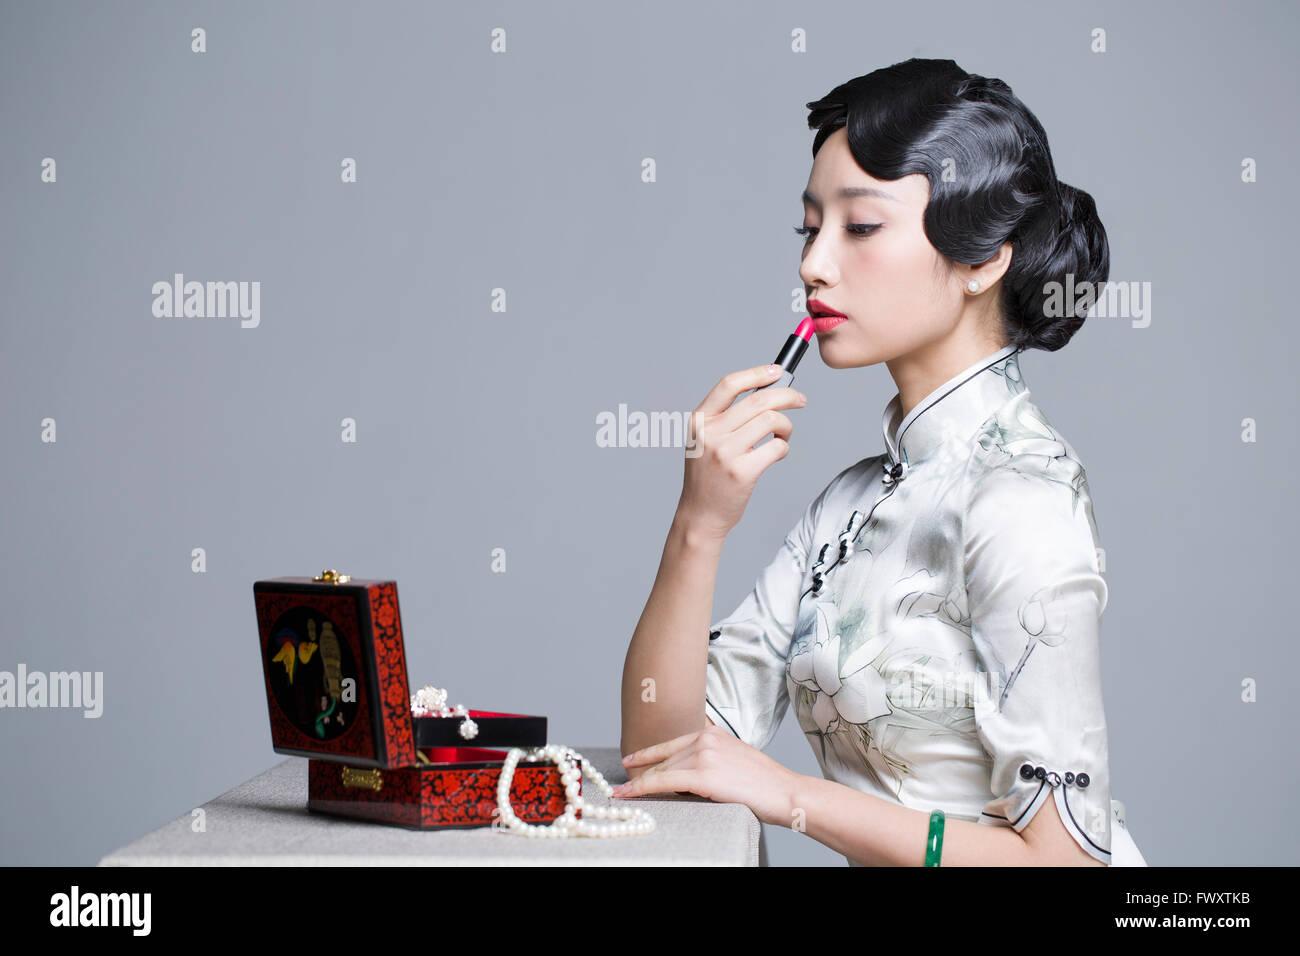 Young Asian Women Applying Lipstick Stock Photos & Young